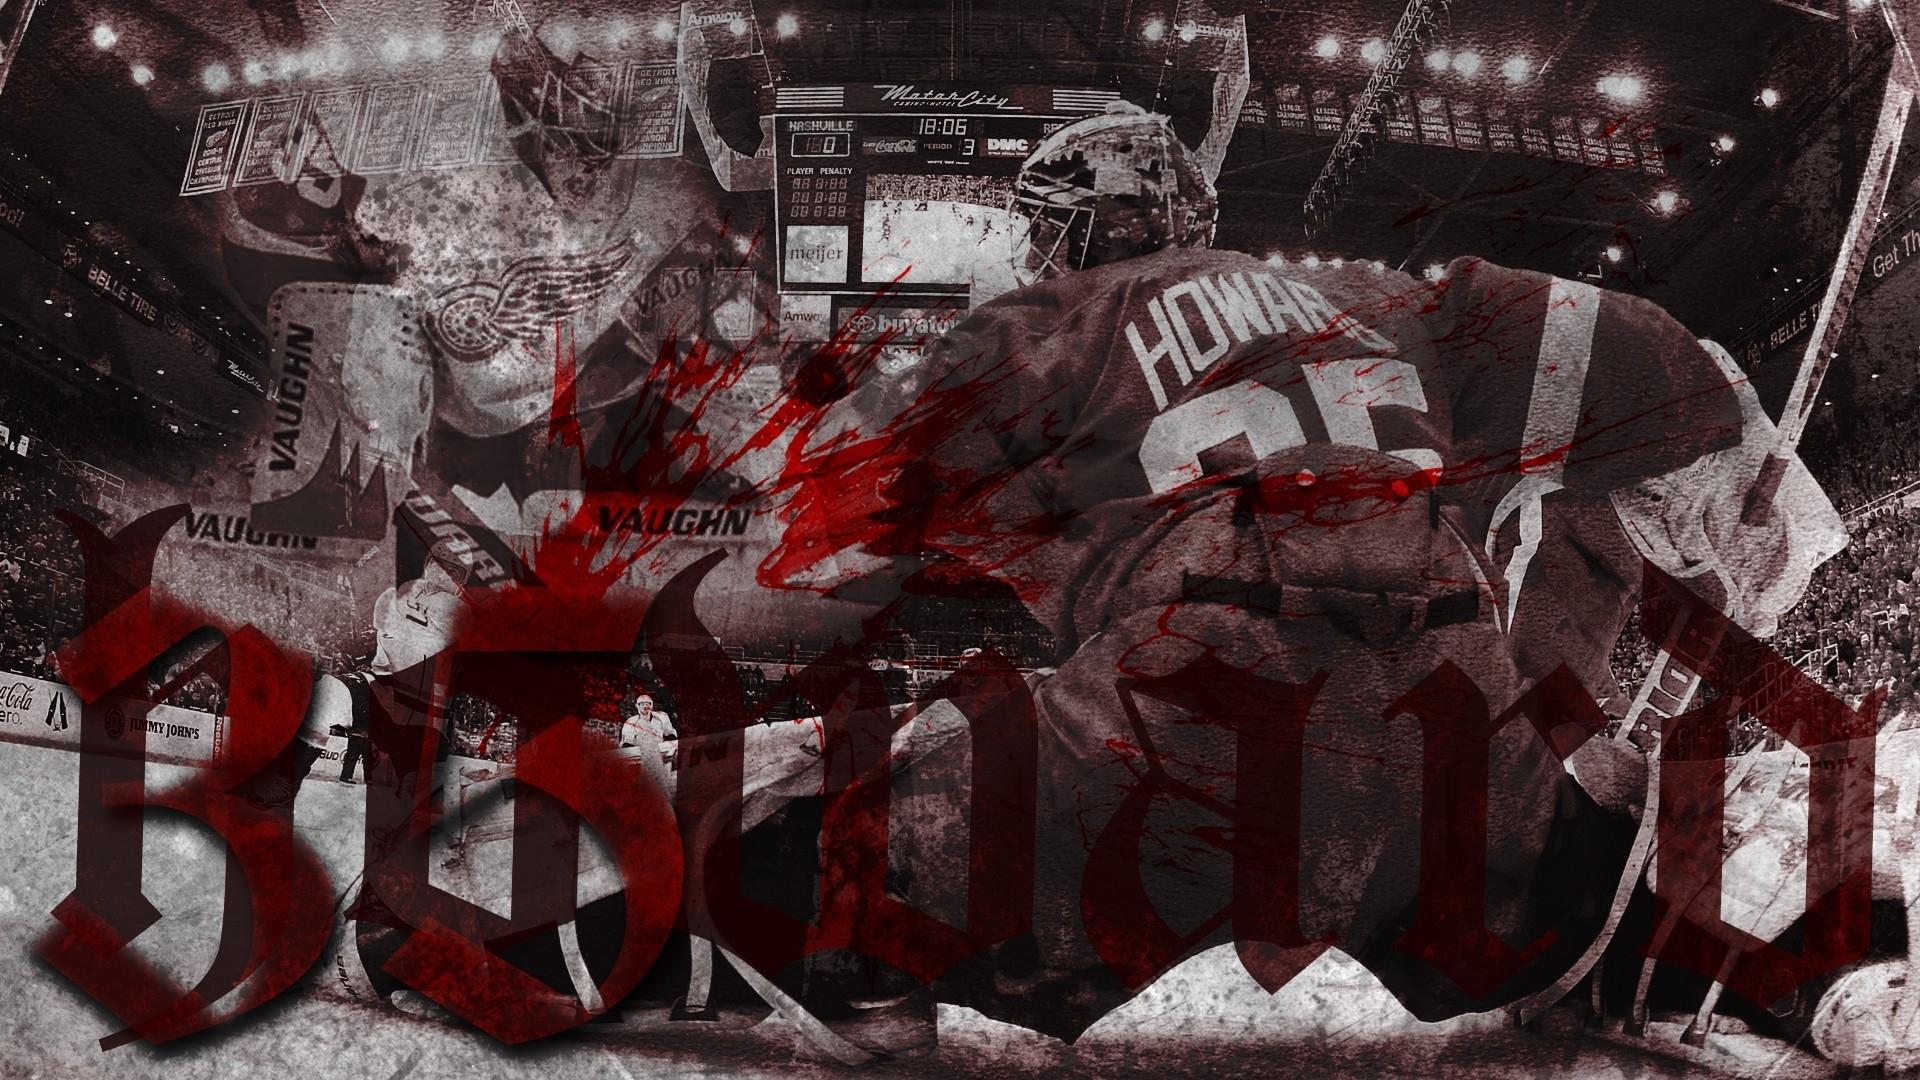 Hockey detroit red wings goalie jimmy howard g wallpaper hockey detroit red wings goalie jimmy howard g wallpaper 1920x1080 128683 wallpaperup voltagebd Choice Image